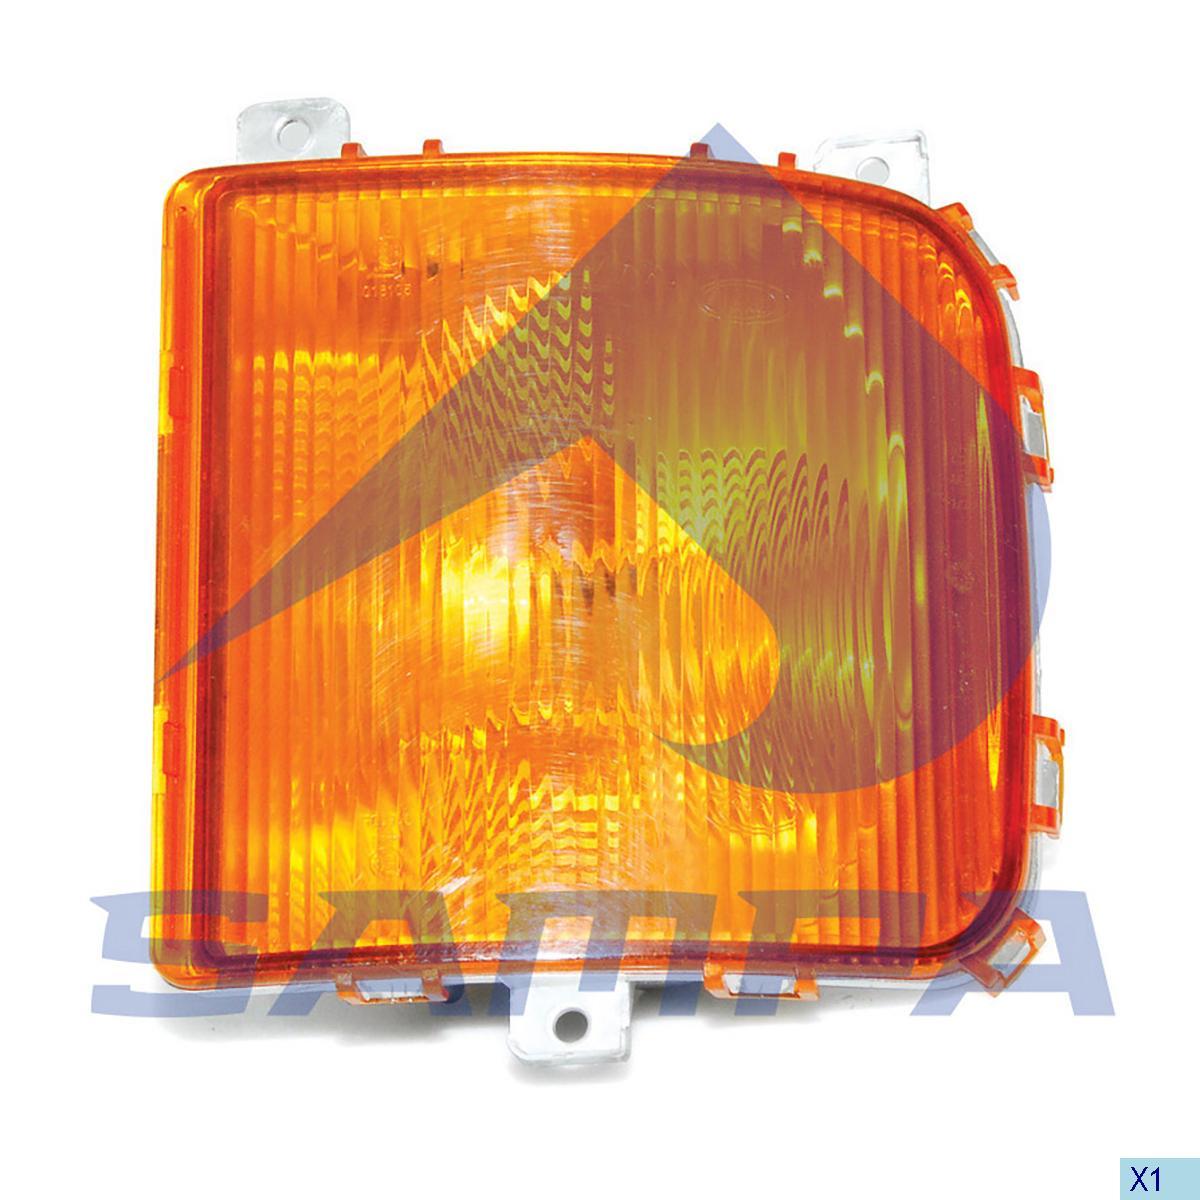 Signal Lamp, Man, Electric System